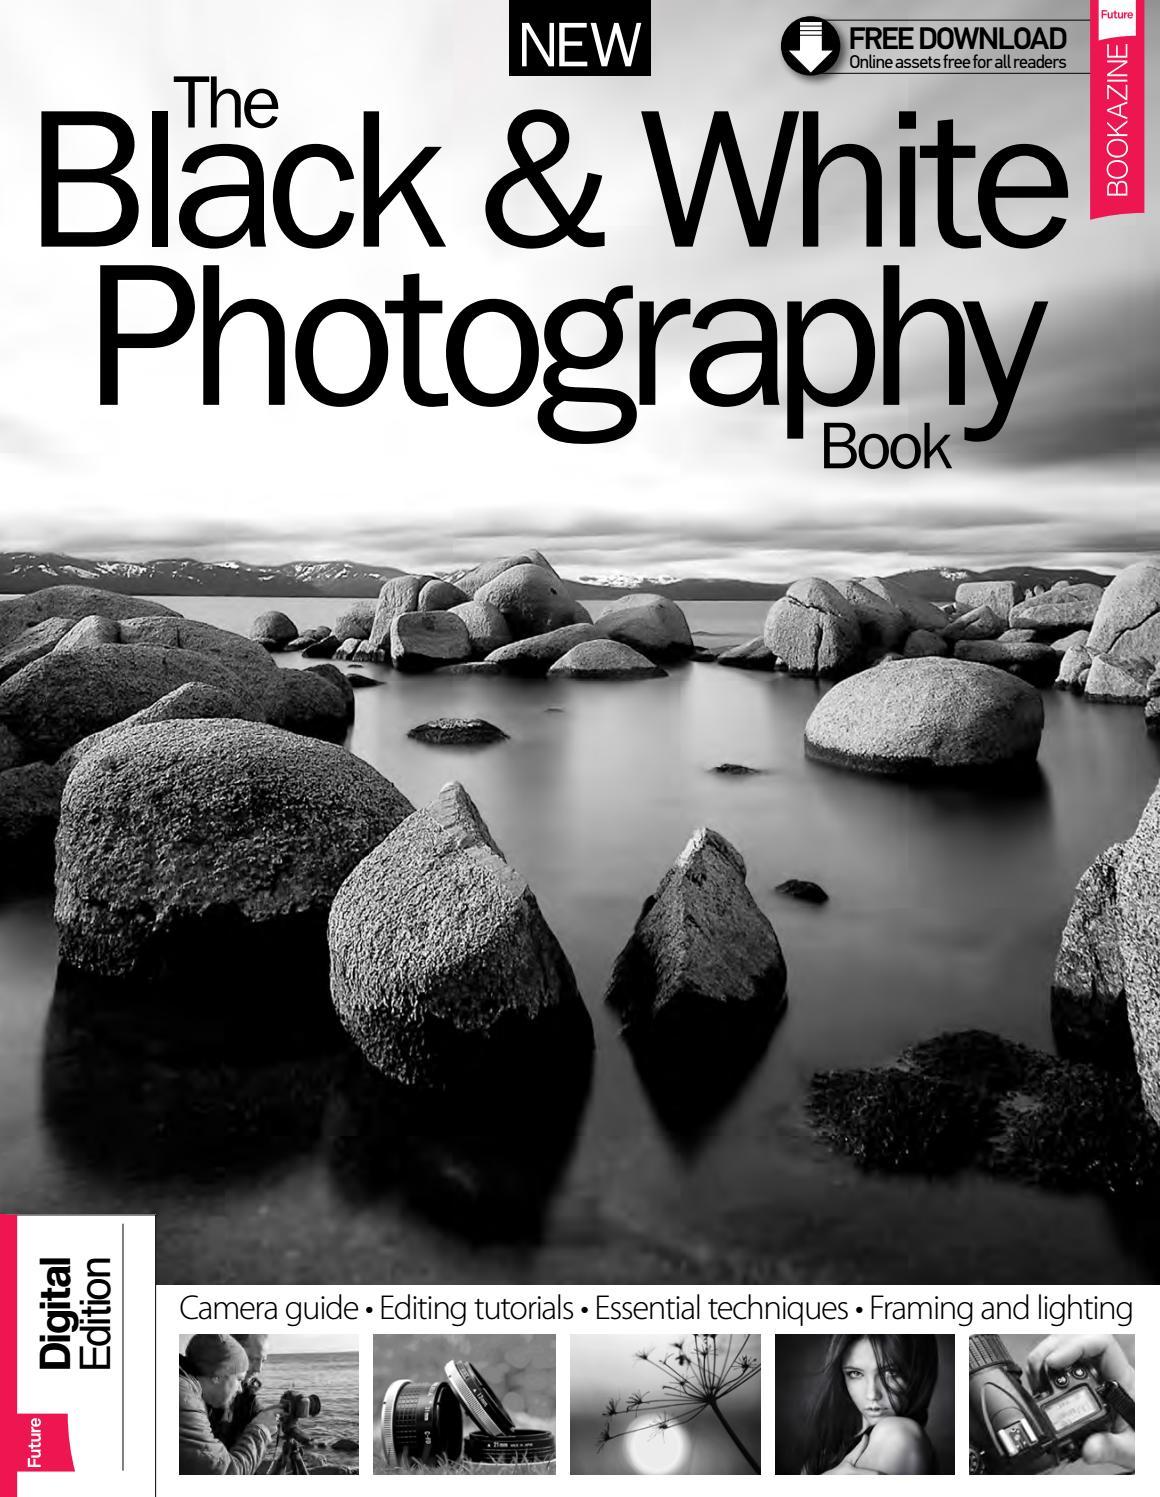 Photography bookazine 1610 sampler